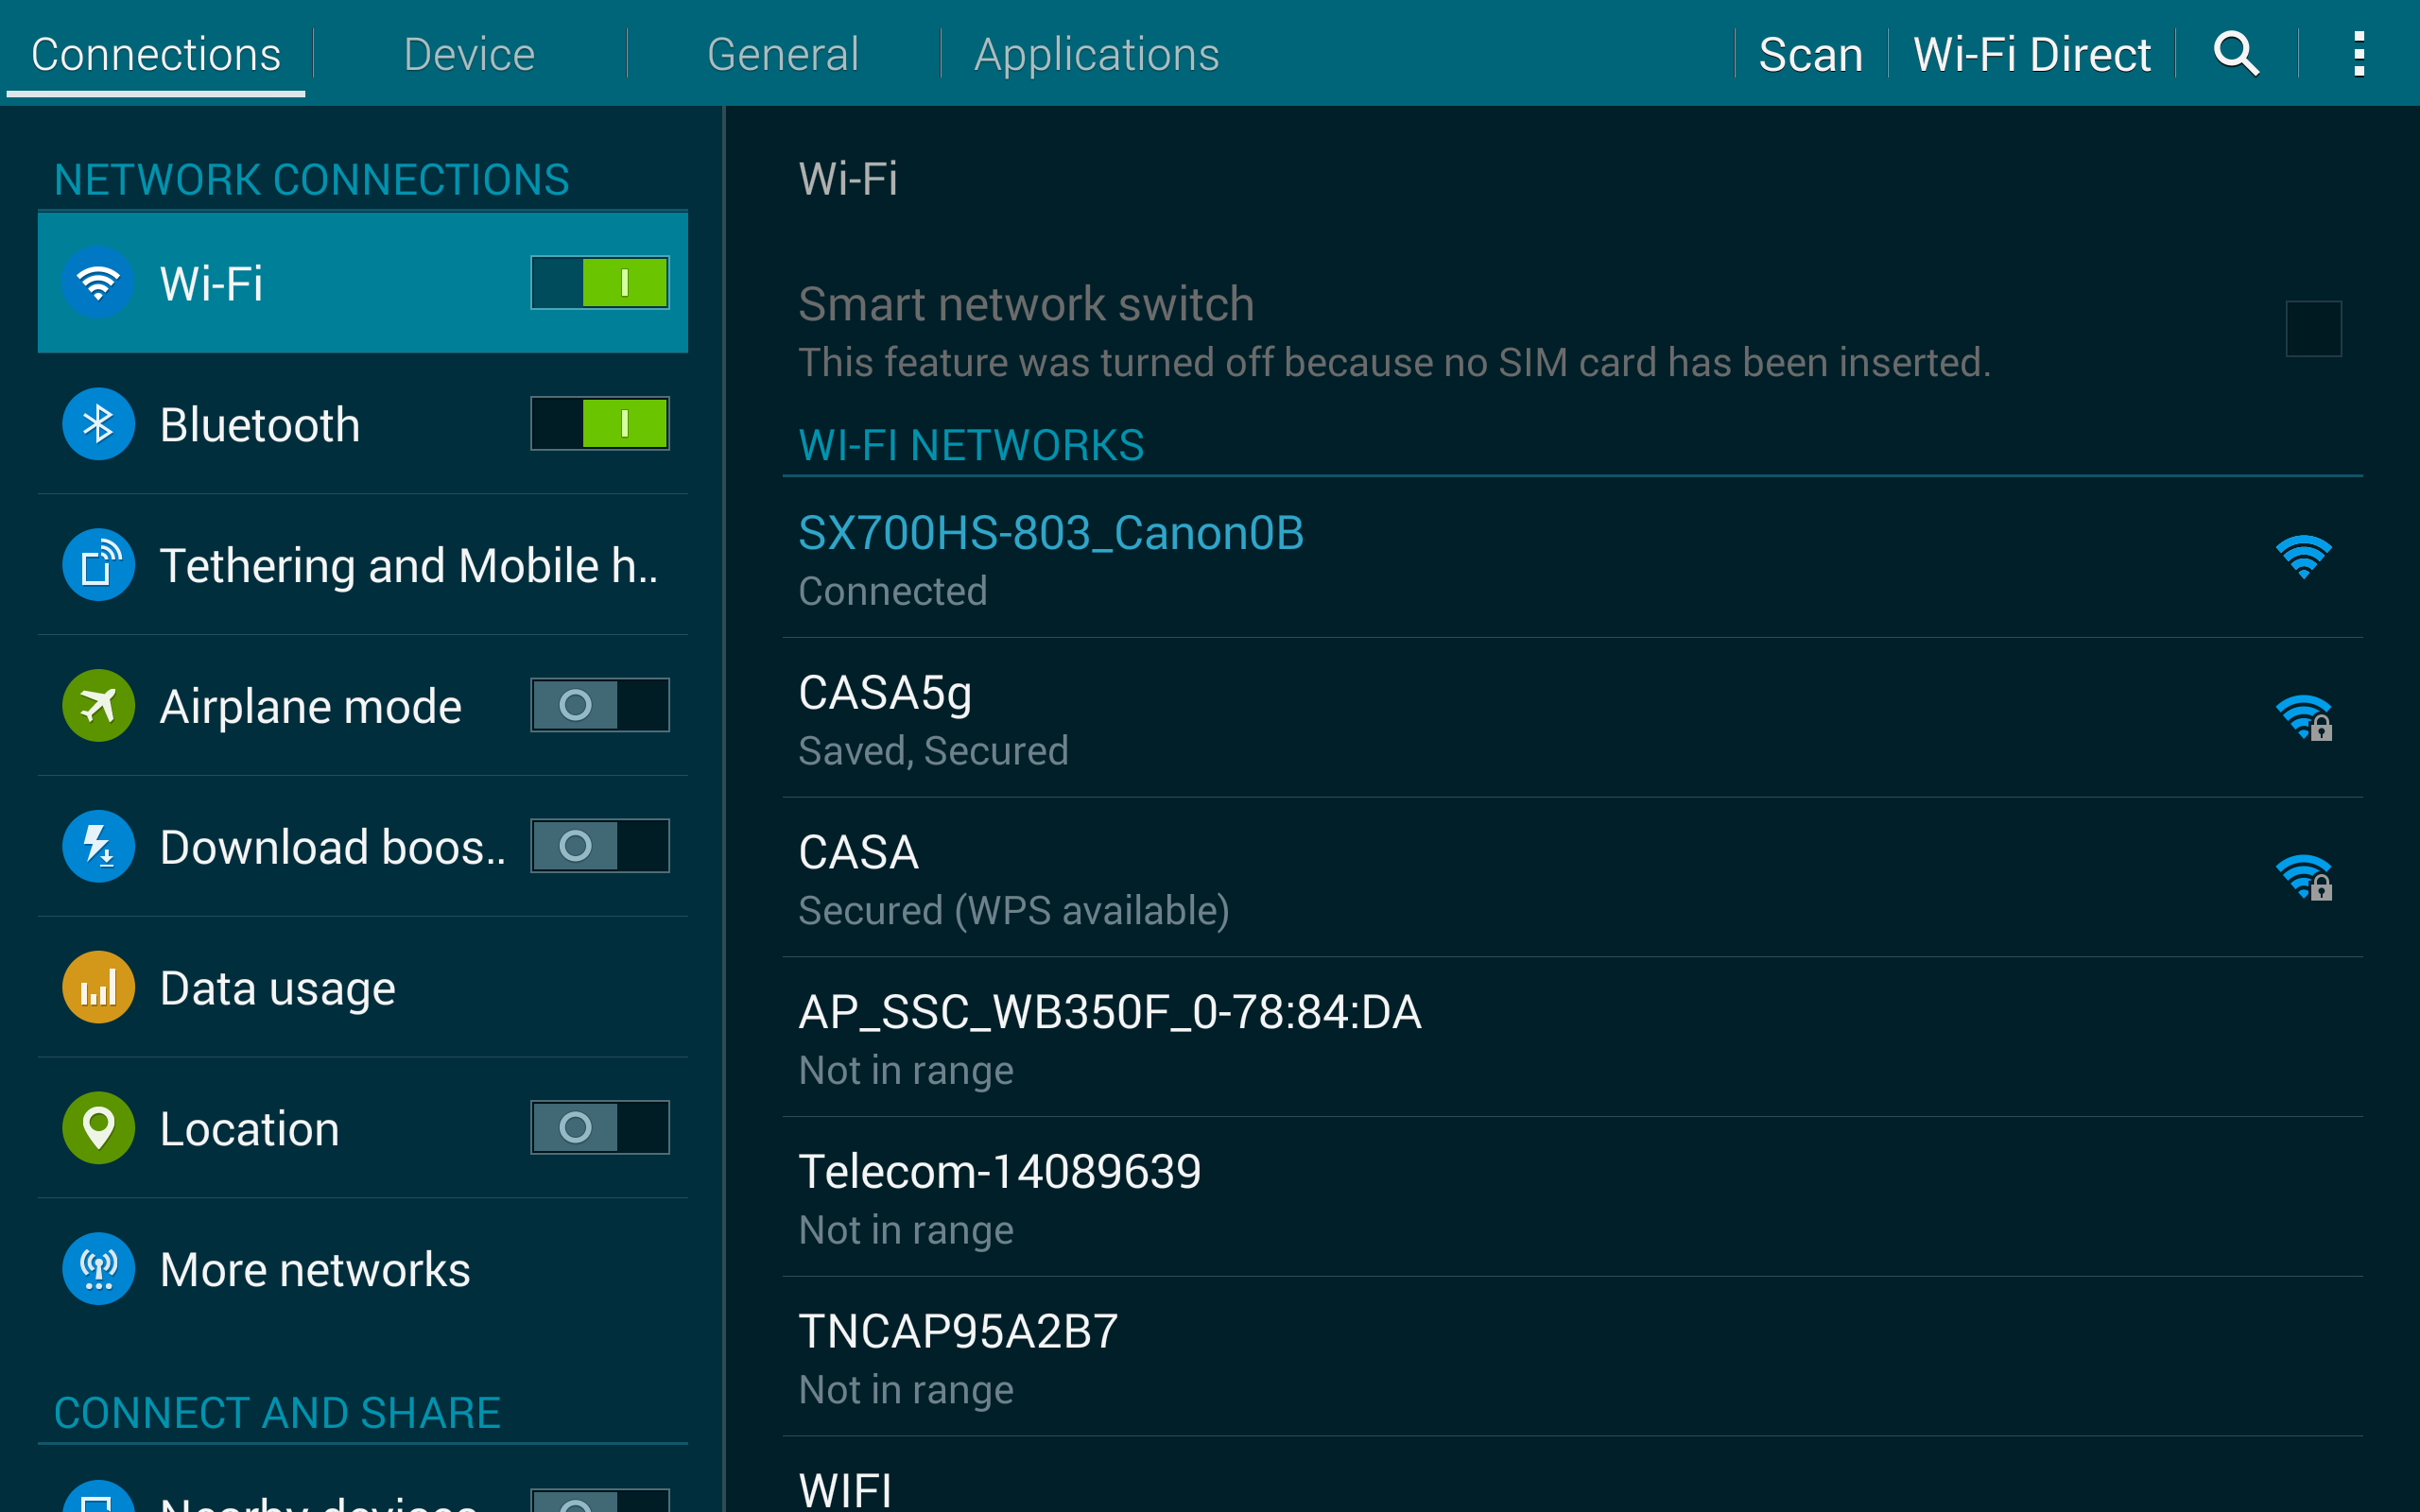 Screenshot_2014-11-25-07-34-20.png